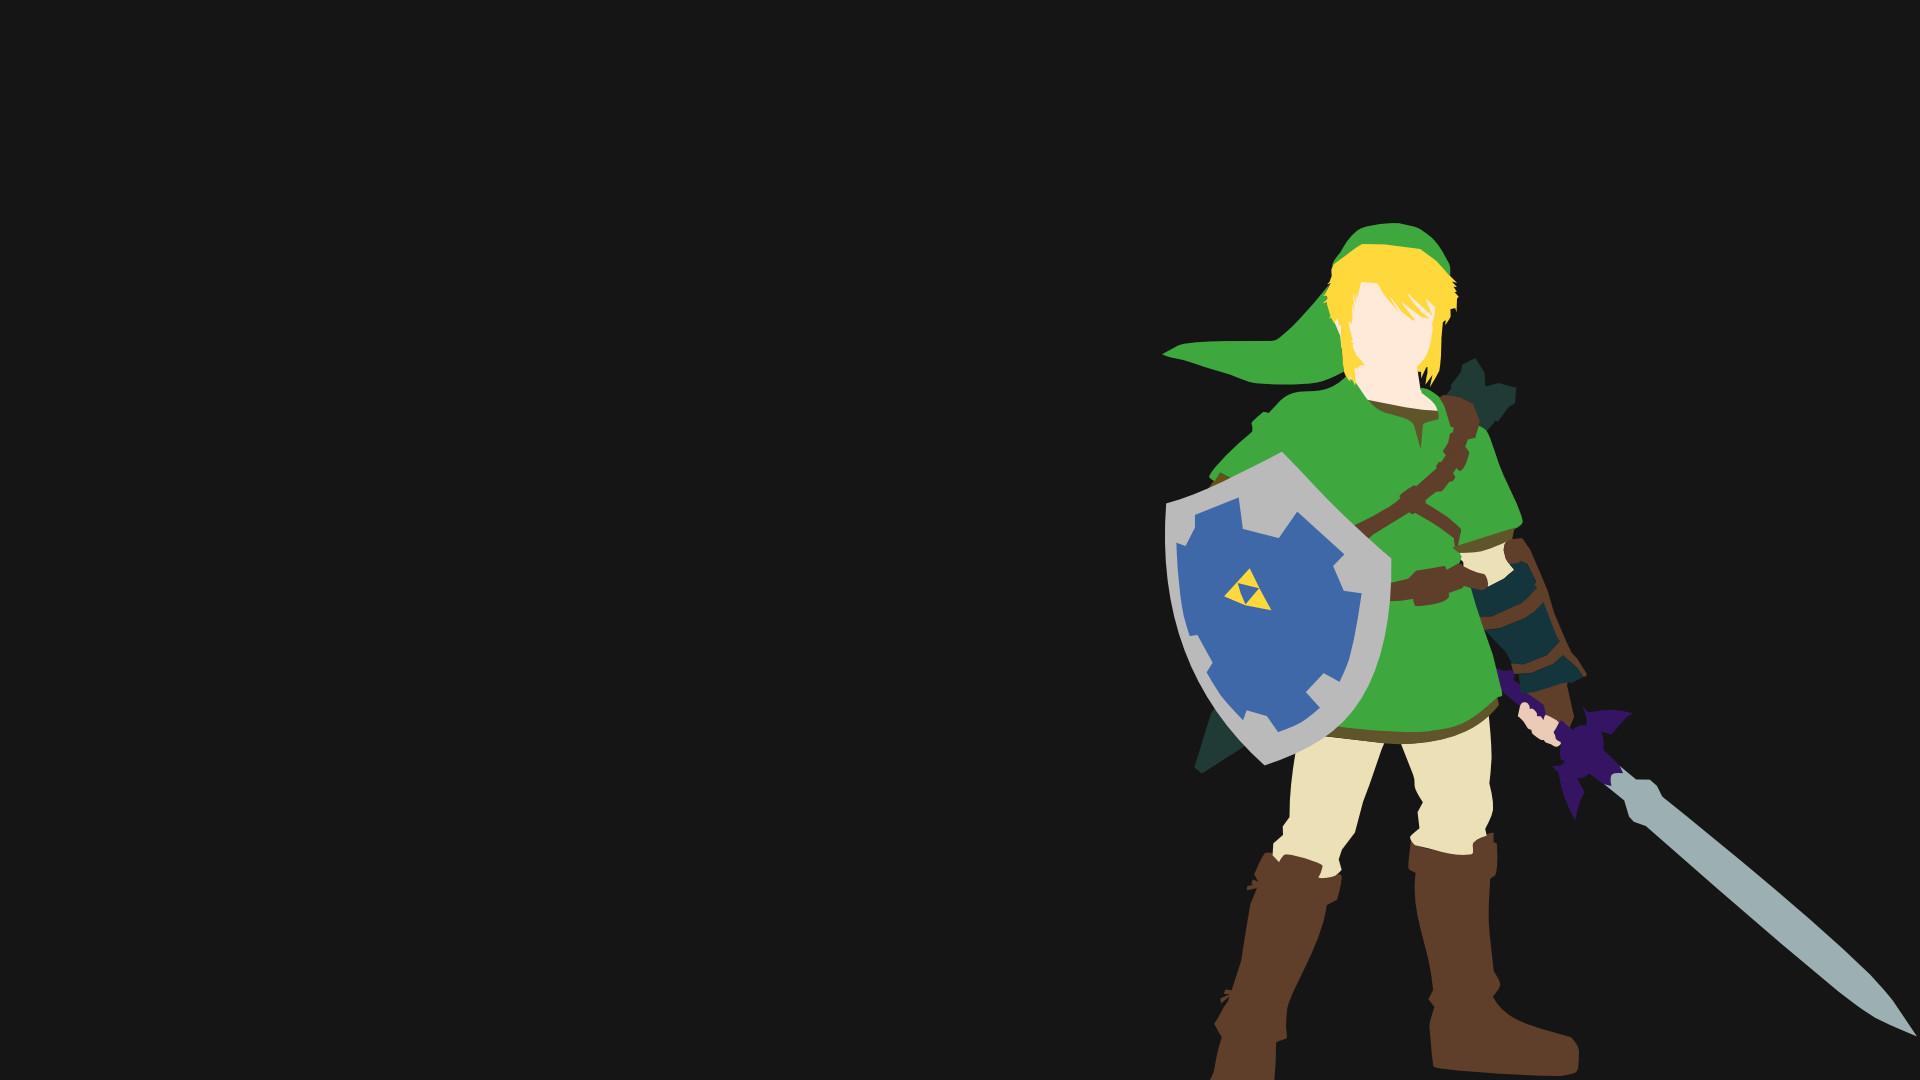 Legend Of Zelda Link Wallpaper 70 Images